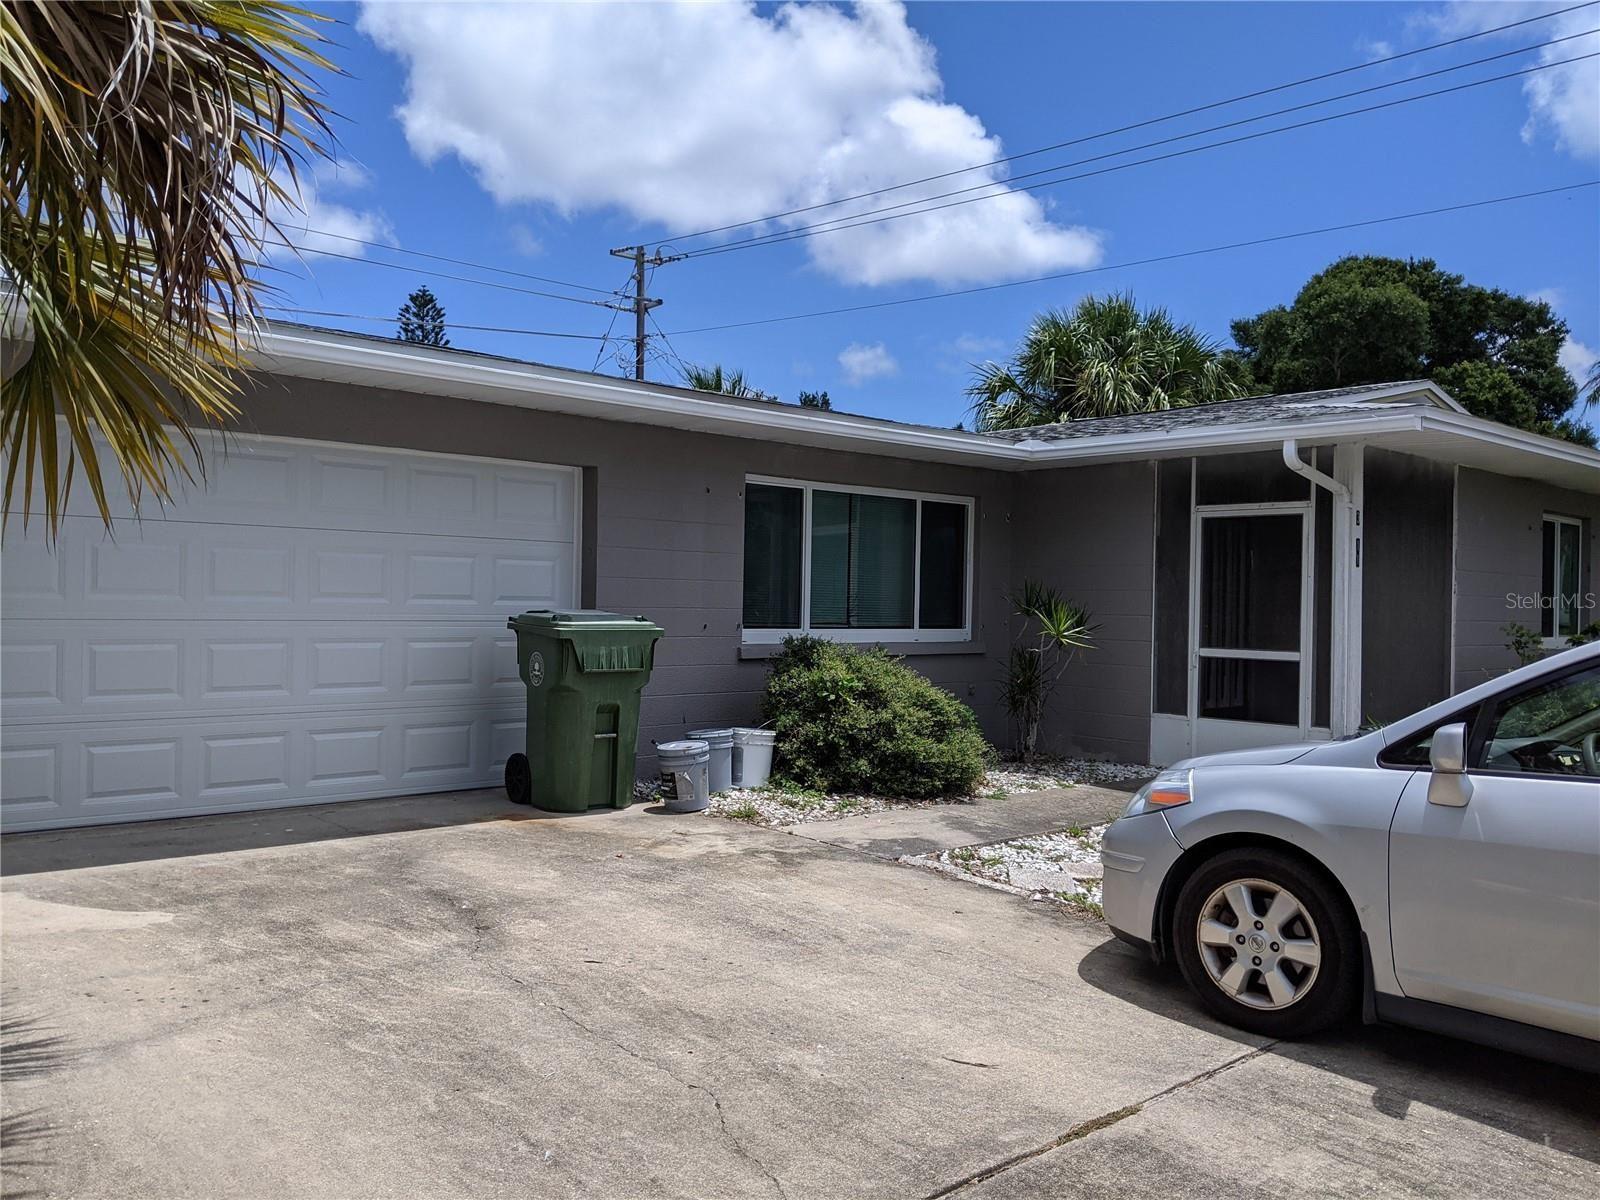 Photo of 3611 SOUTHERN PARKWAY W, BRADENTON, FL 34205 (MLS # A4508397)